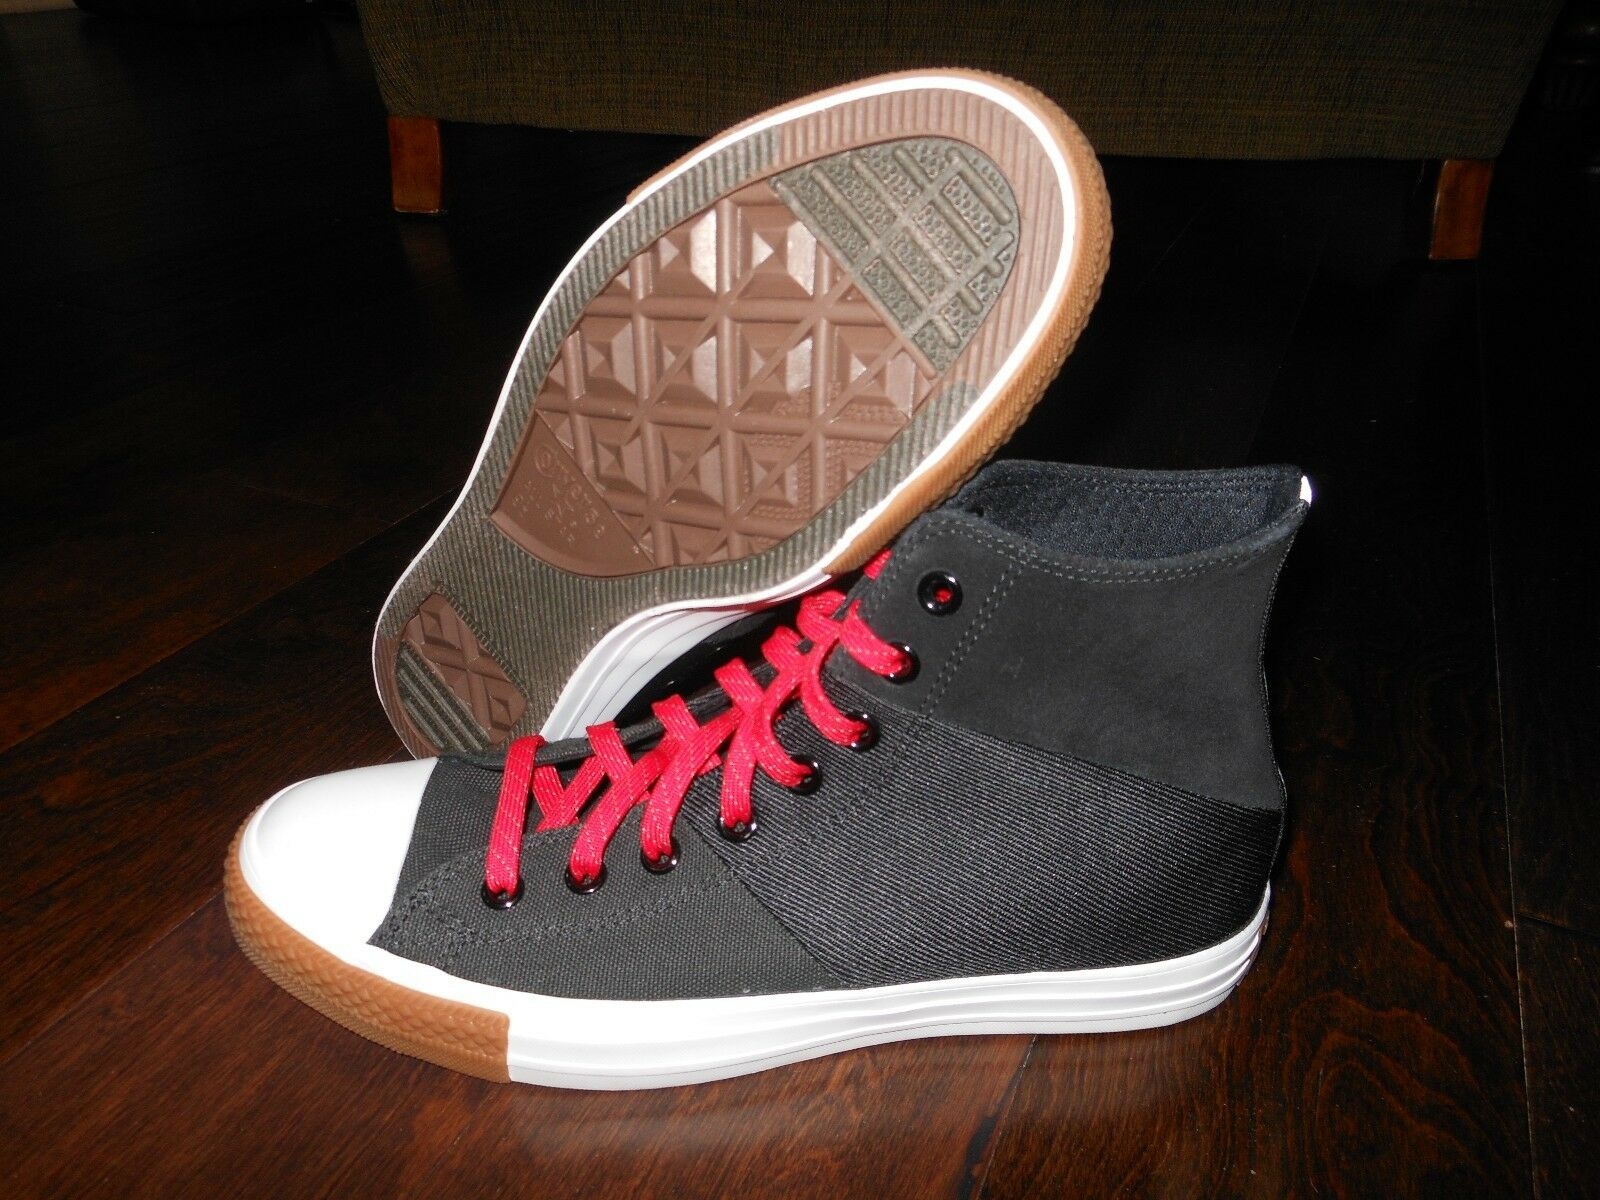 CONVERSE CT TRI PANEL HI 144652F Shoes Size 9.5 US 43 EUR Black/Red